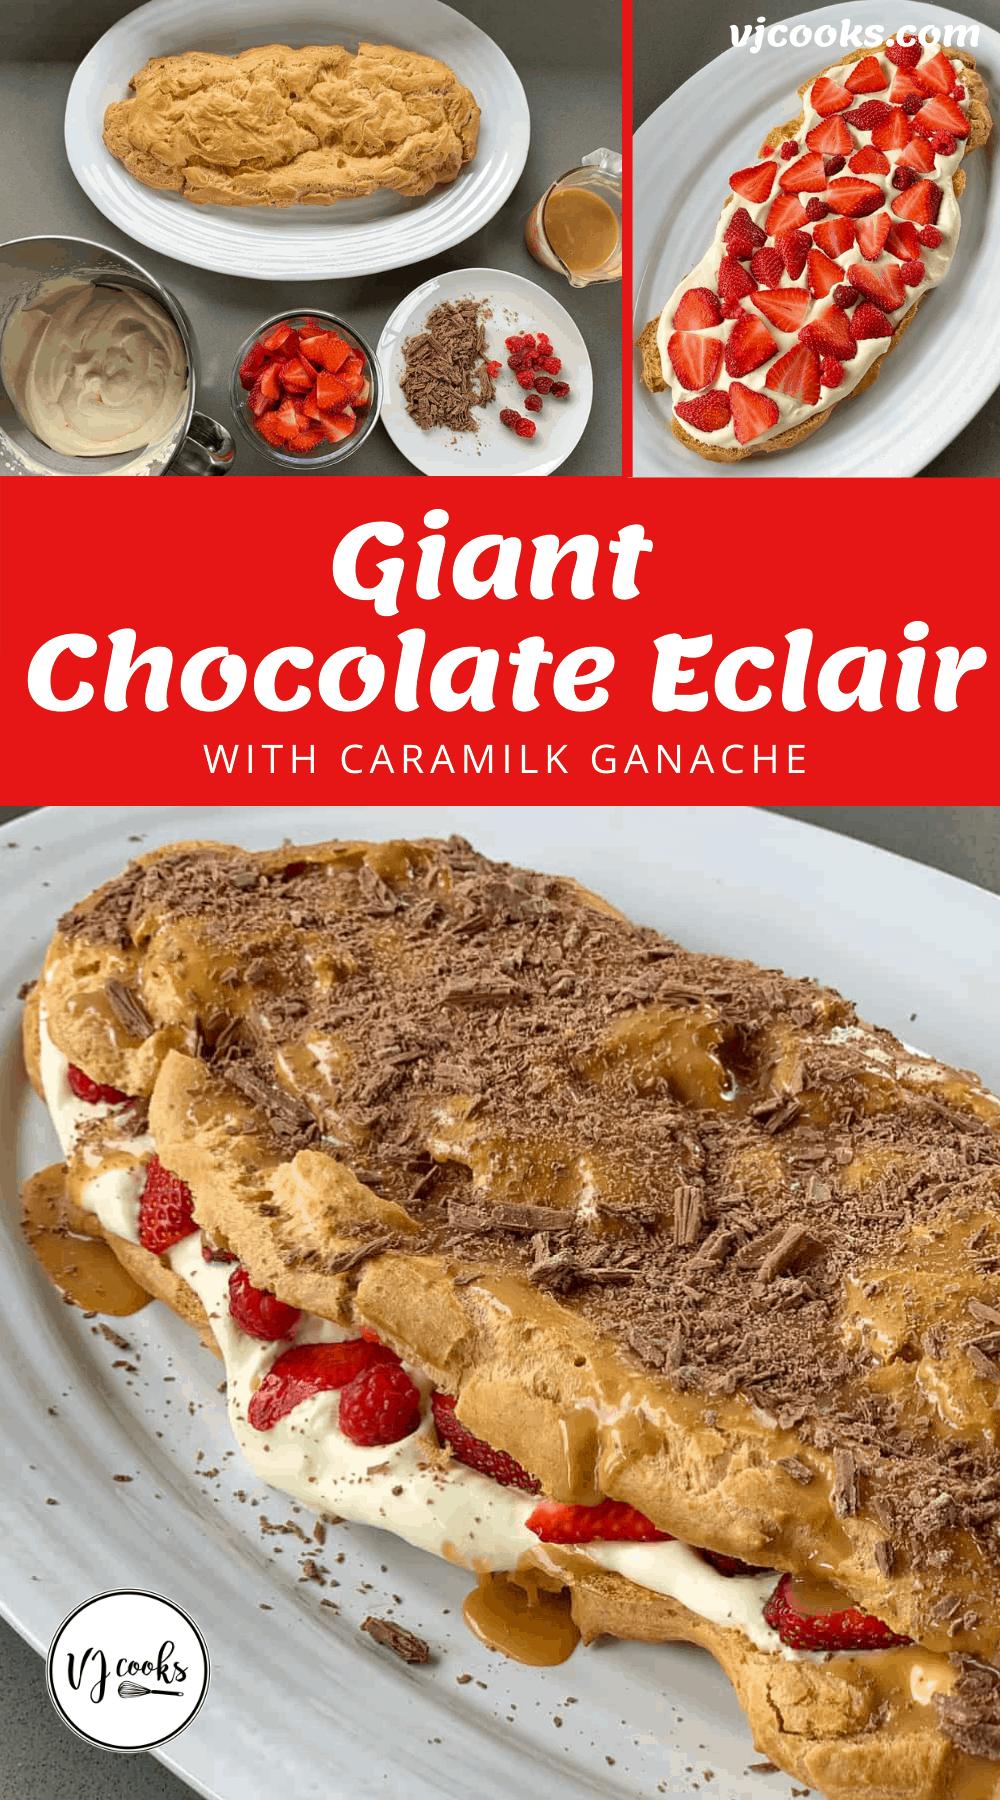 Giant Choc Eclair